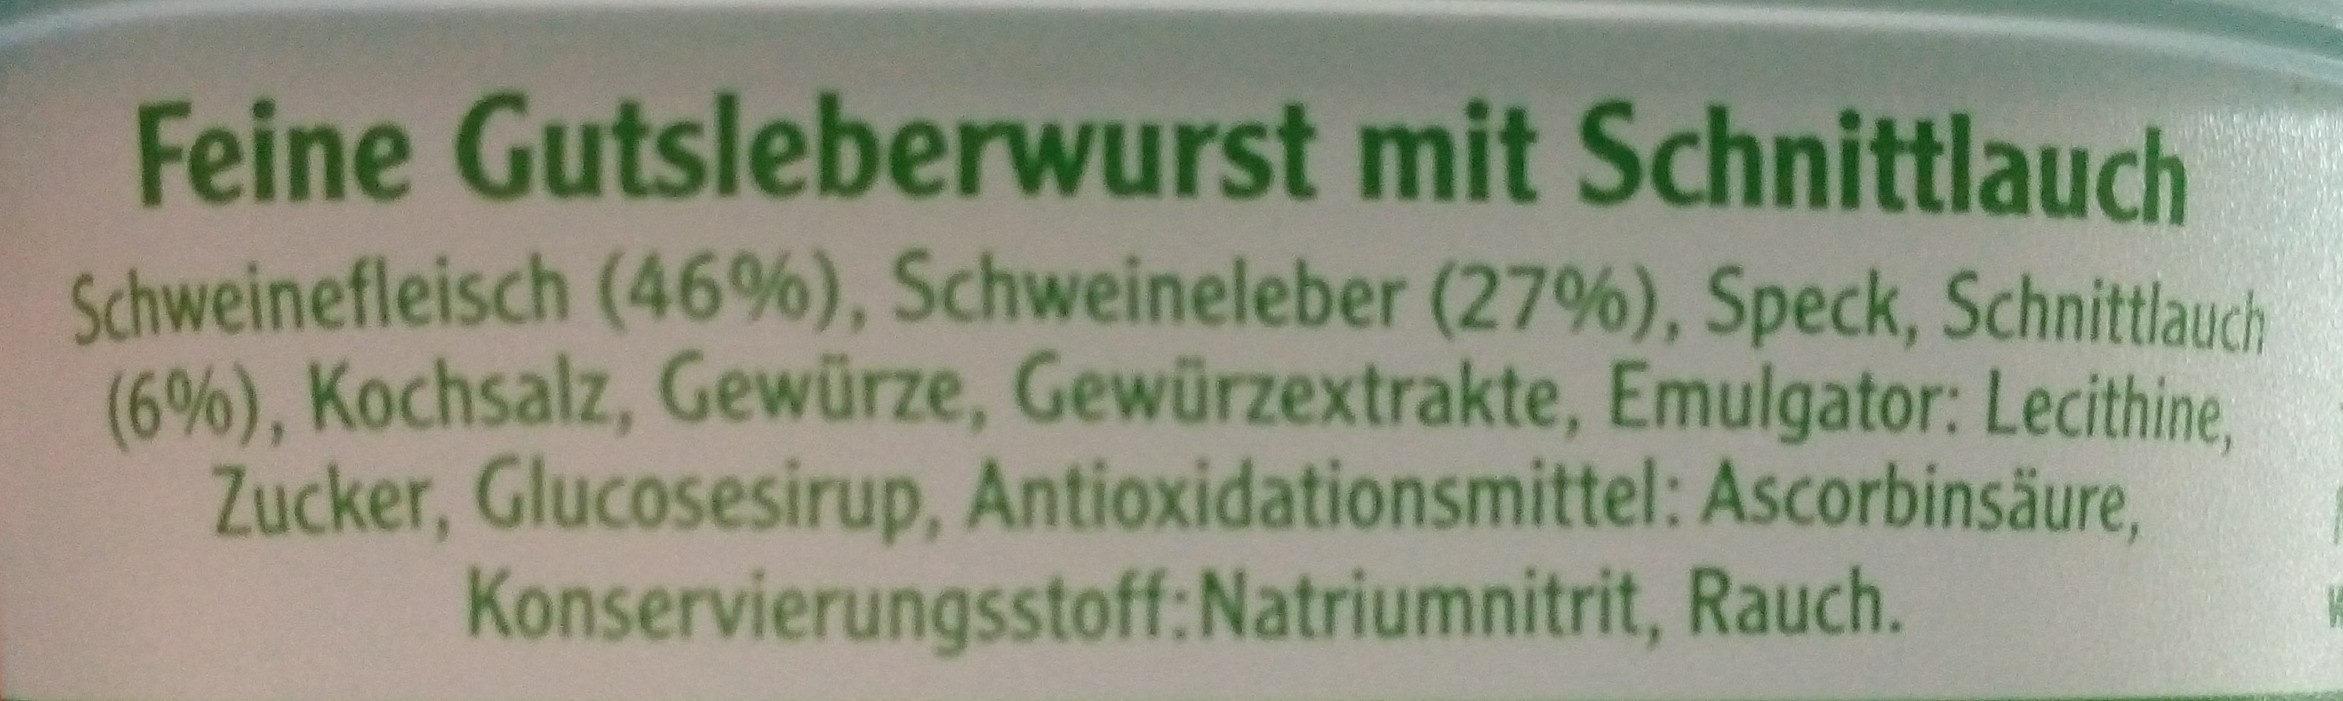 Leberwurst - Ingredients - fr